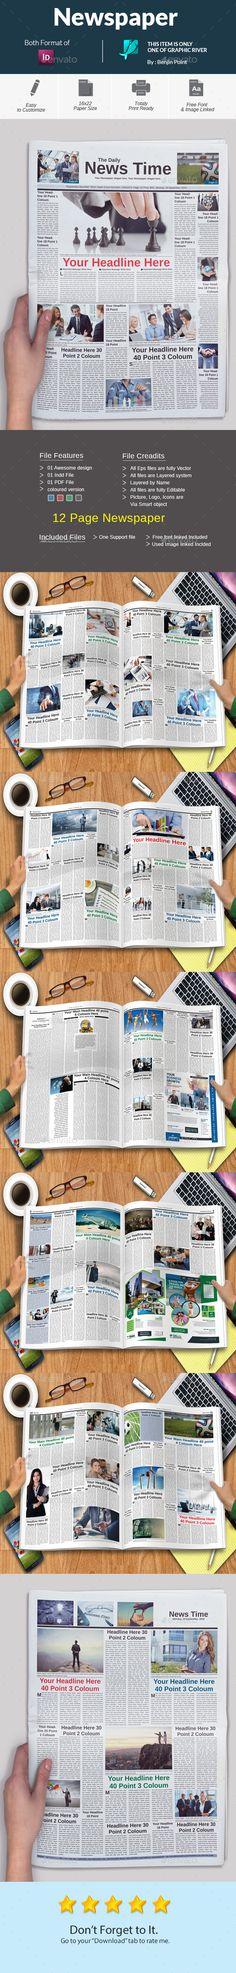 Newspaper - Newsletters Print Templates Download here : https://graphicriver.net/item/newspaper/17990259?s_rank=46&ref=Al-fatih